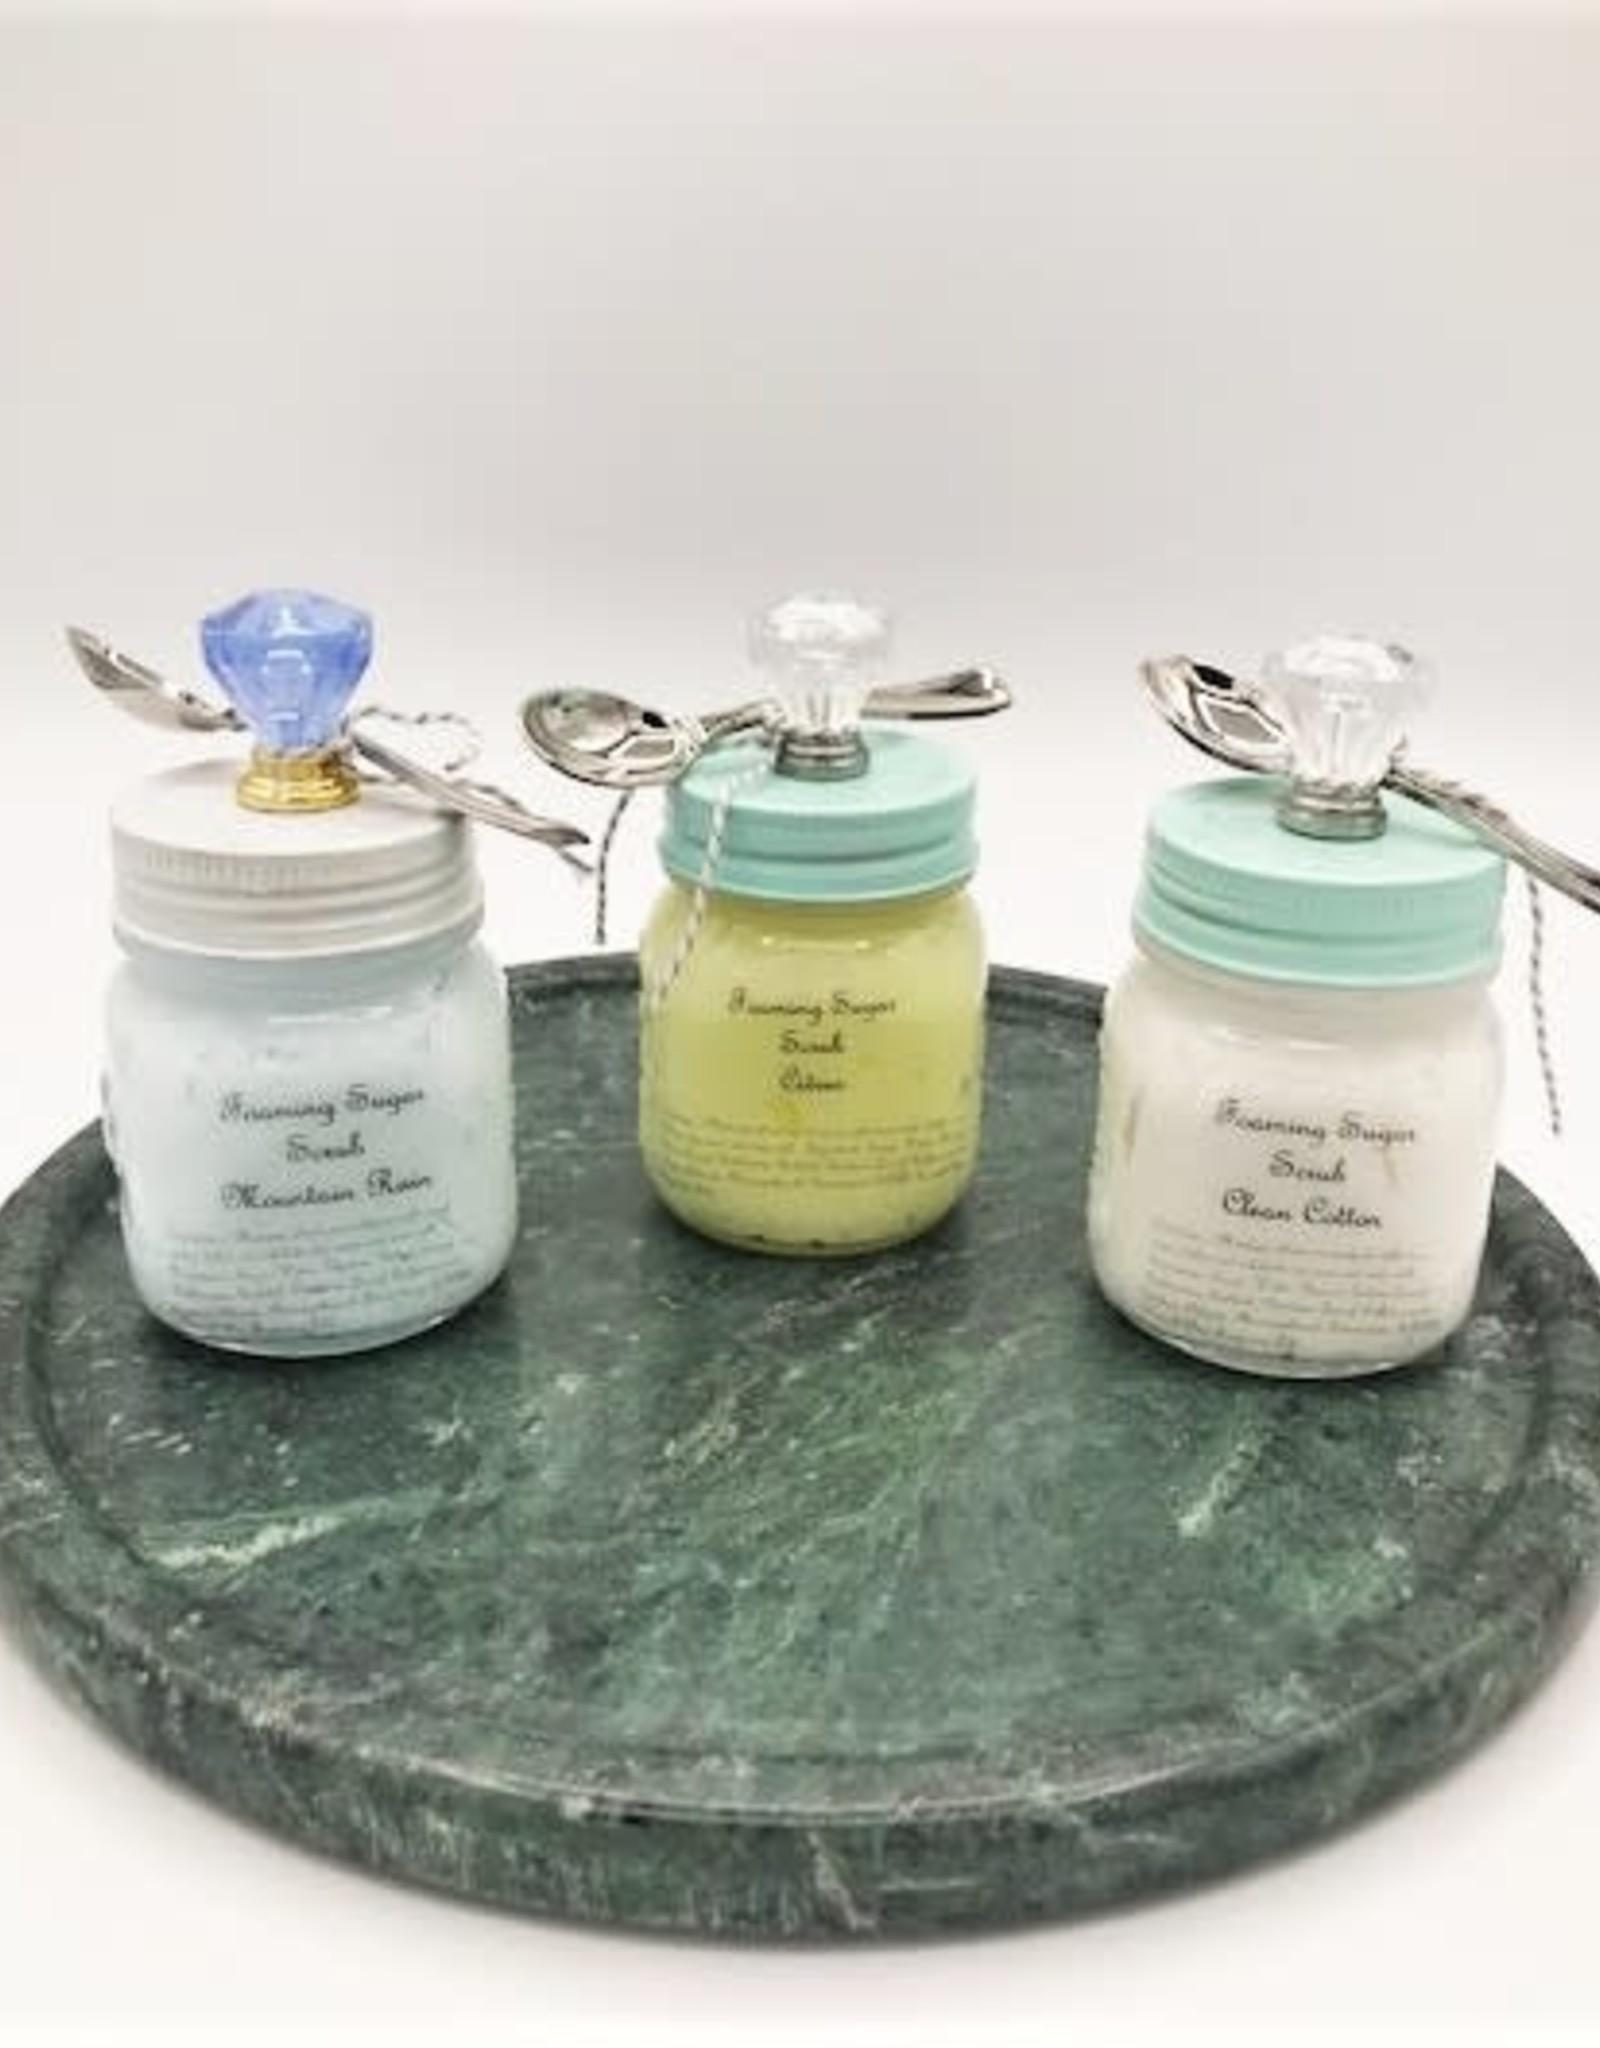 Tish's Bath & Suds Foaming Sugar Scrub - Three Scents